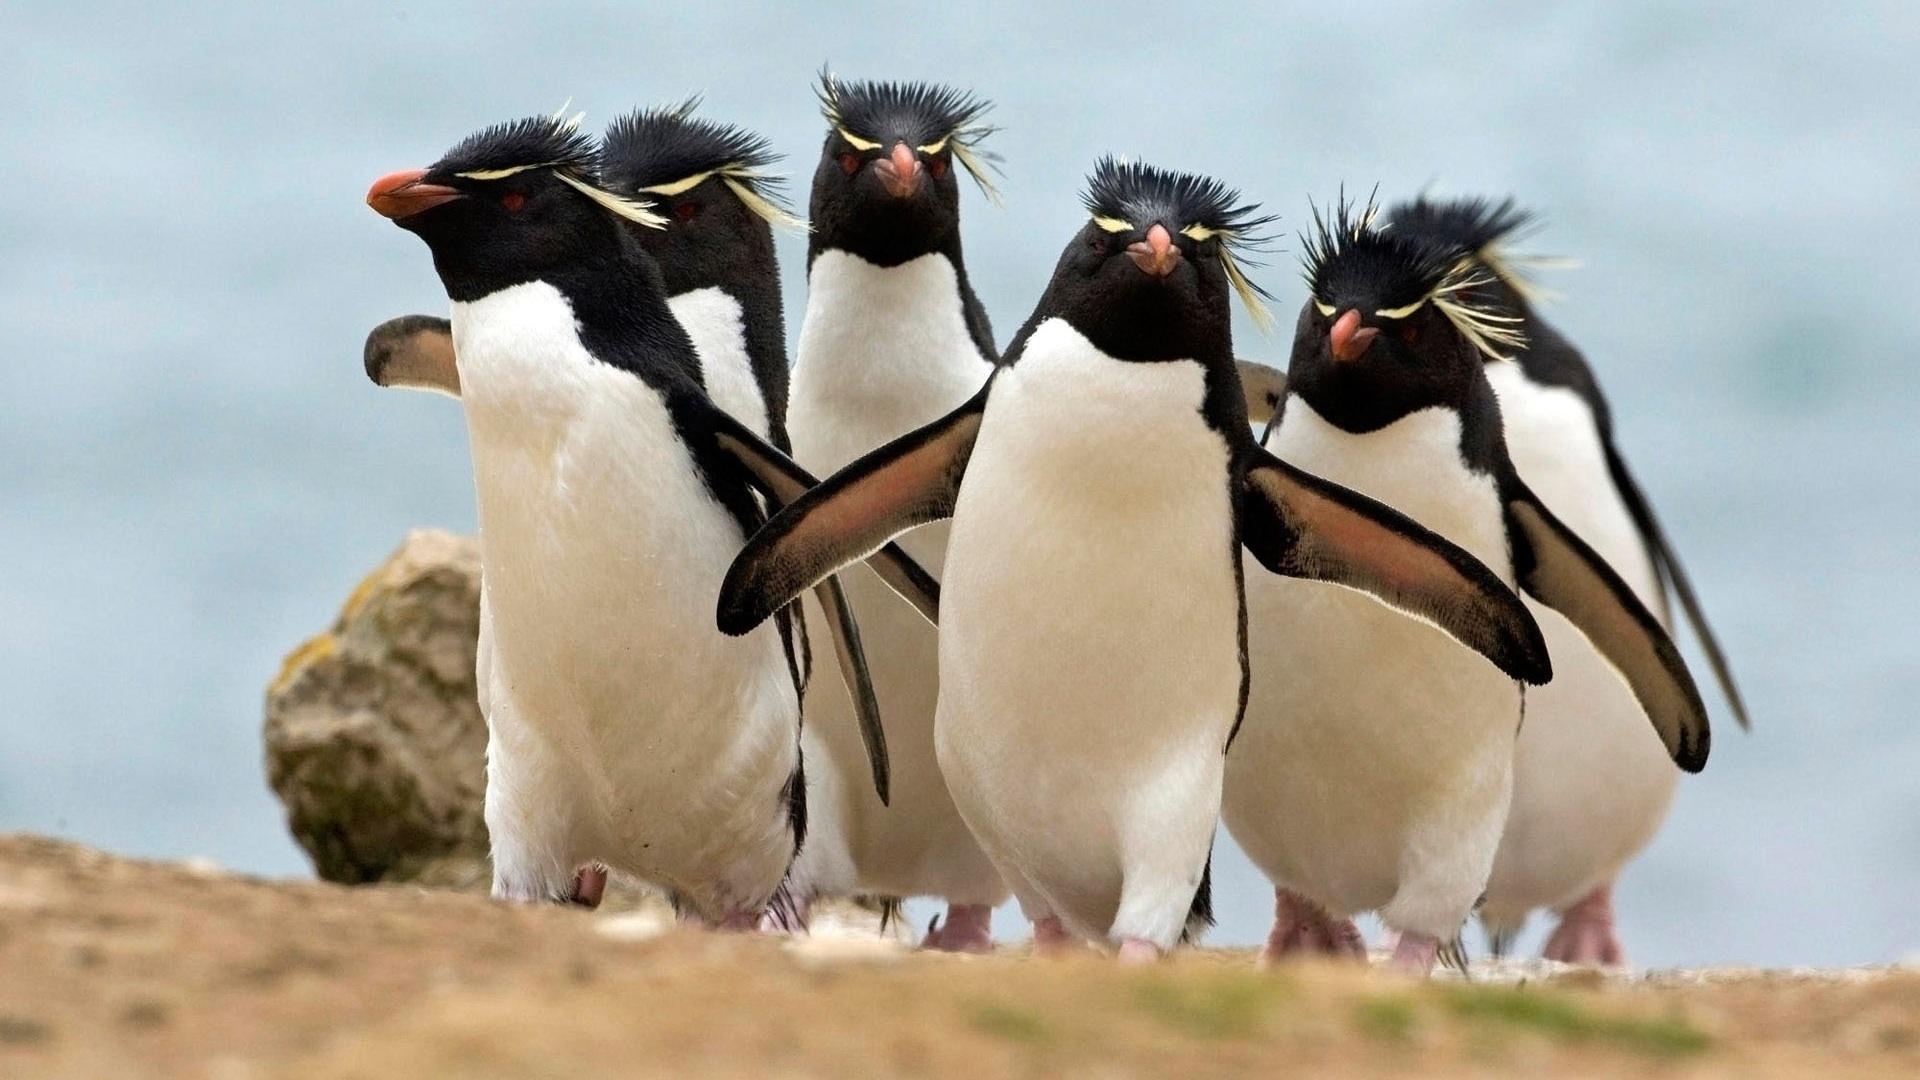 нехитрыми секретами пингвины прикол фото госдуме